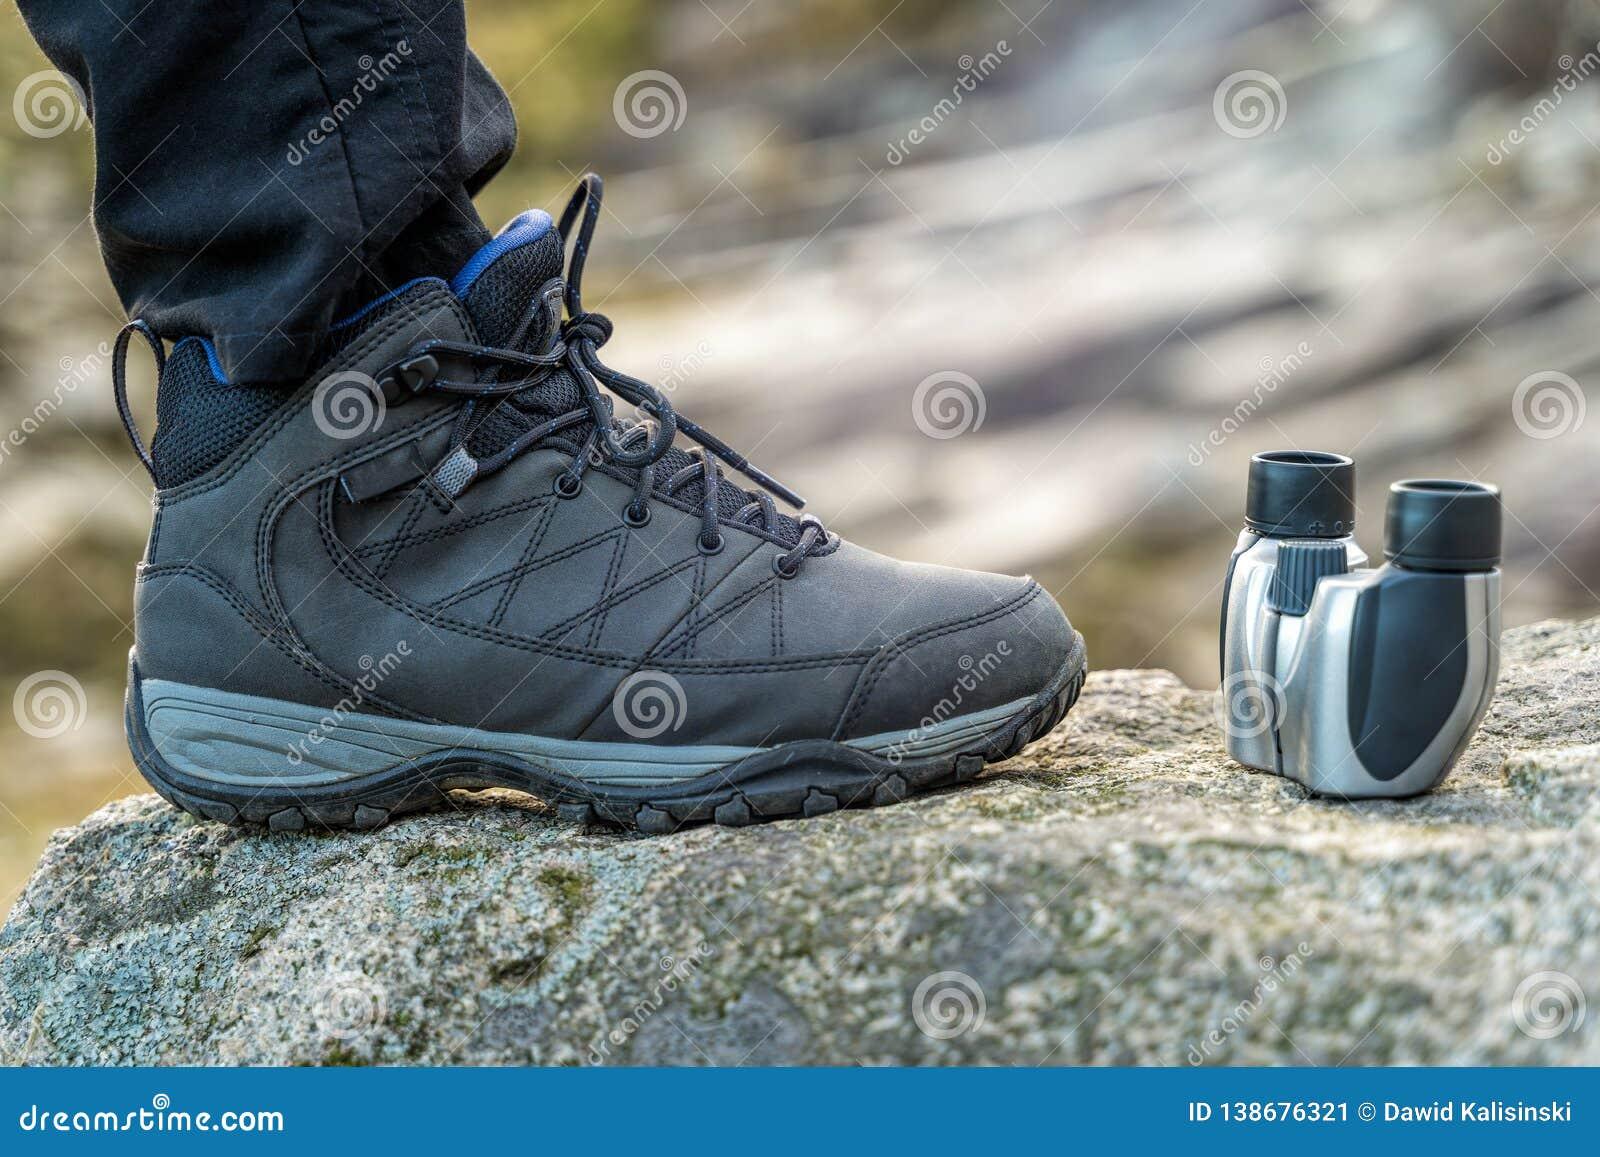 Trekking Shoe And Binocular Closeup On A Rock In The